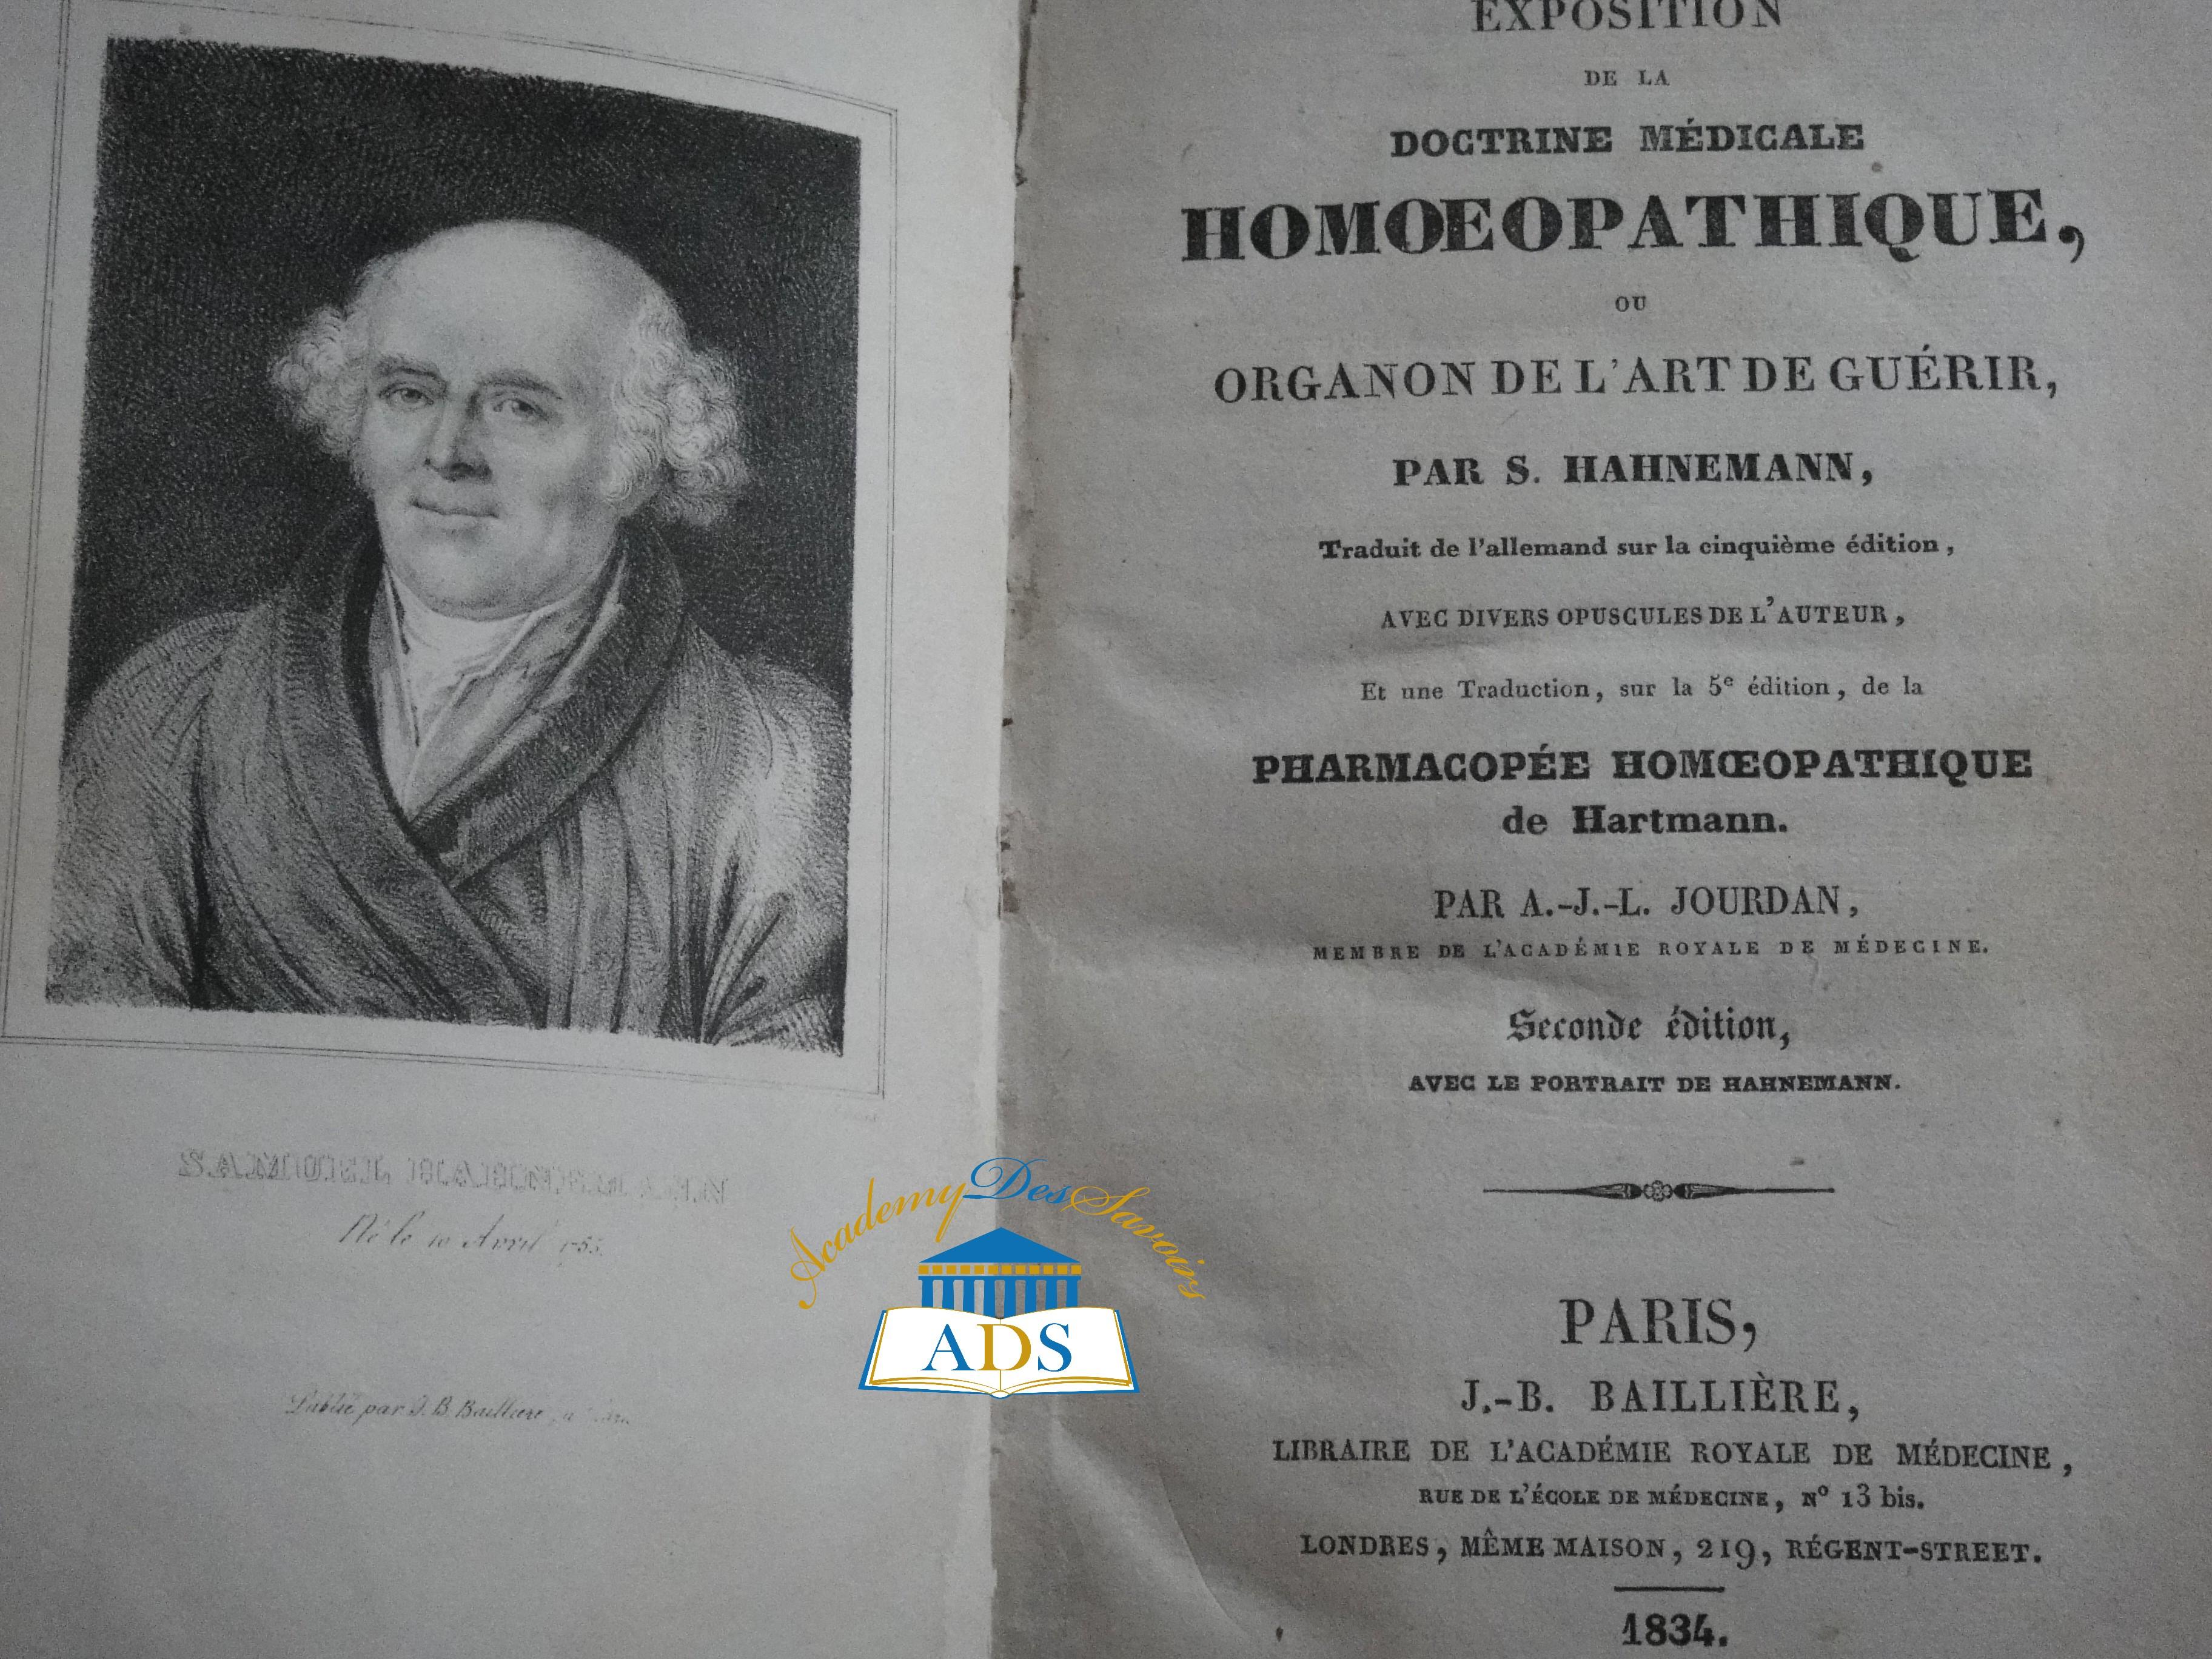 8-Hanhemann et Organon 1834